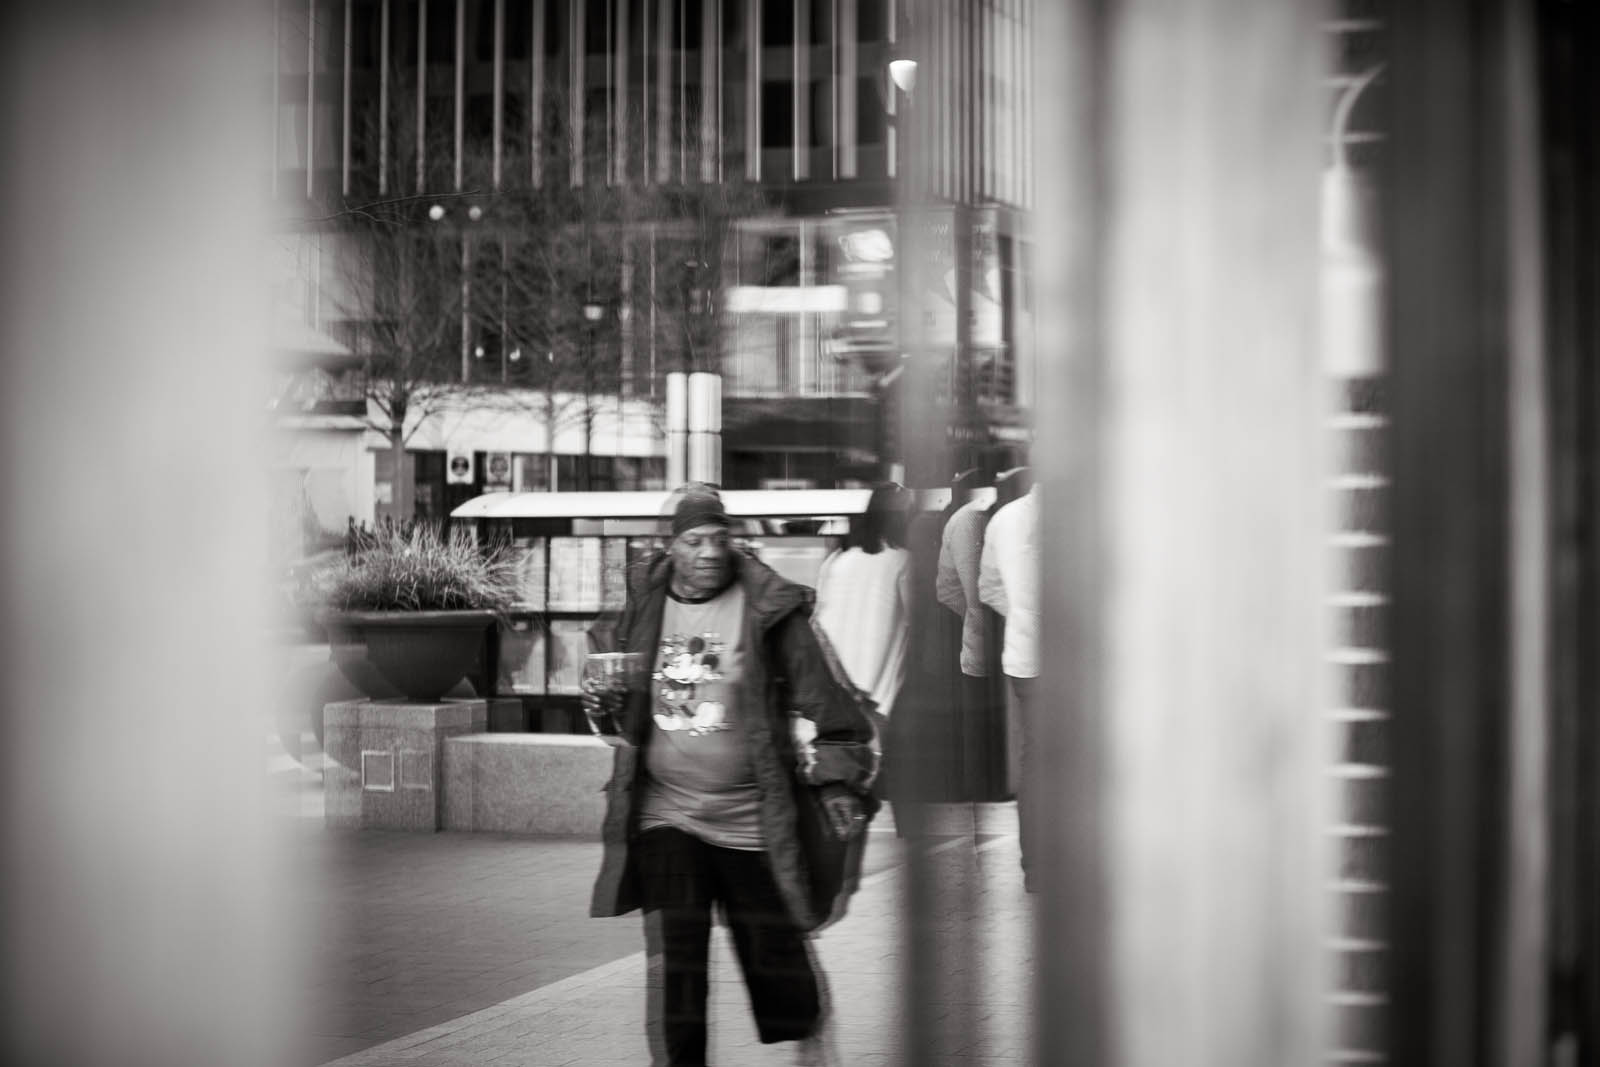 StreetPhotography_DownTownRaleighNC_ErnestoSue-2494.jpg